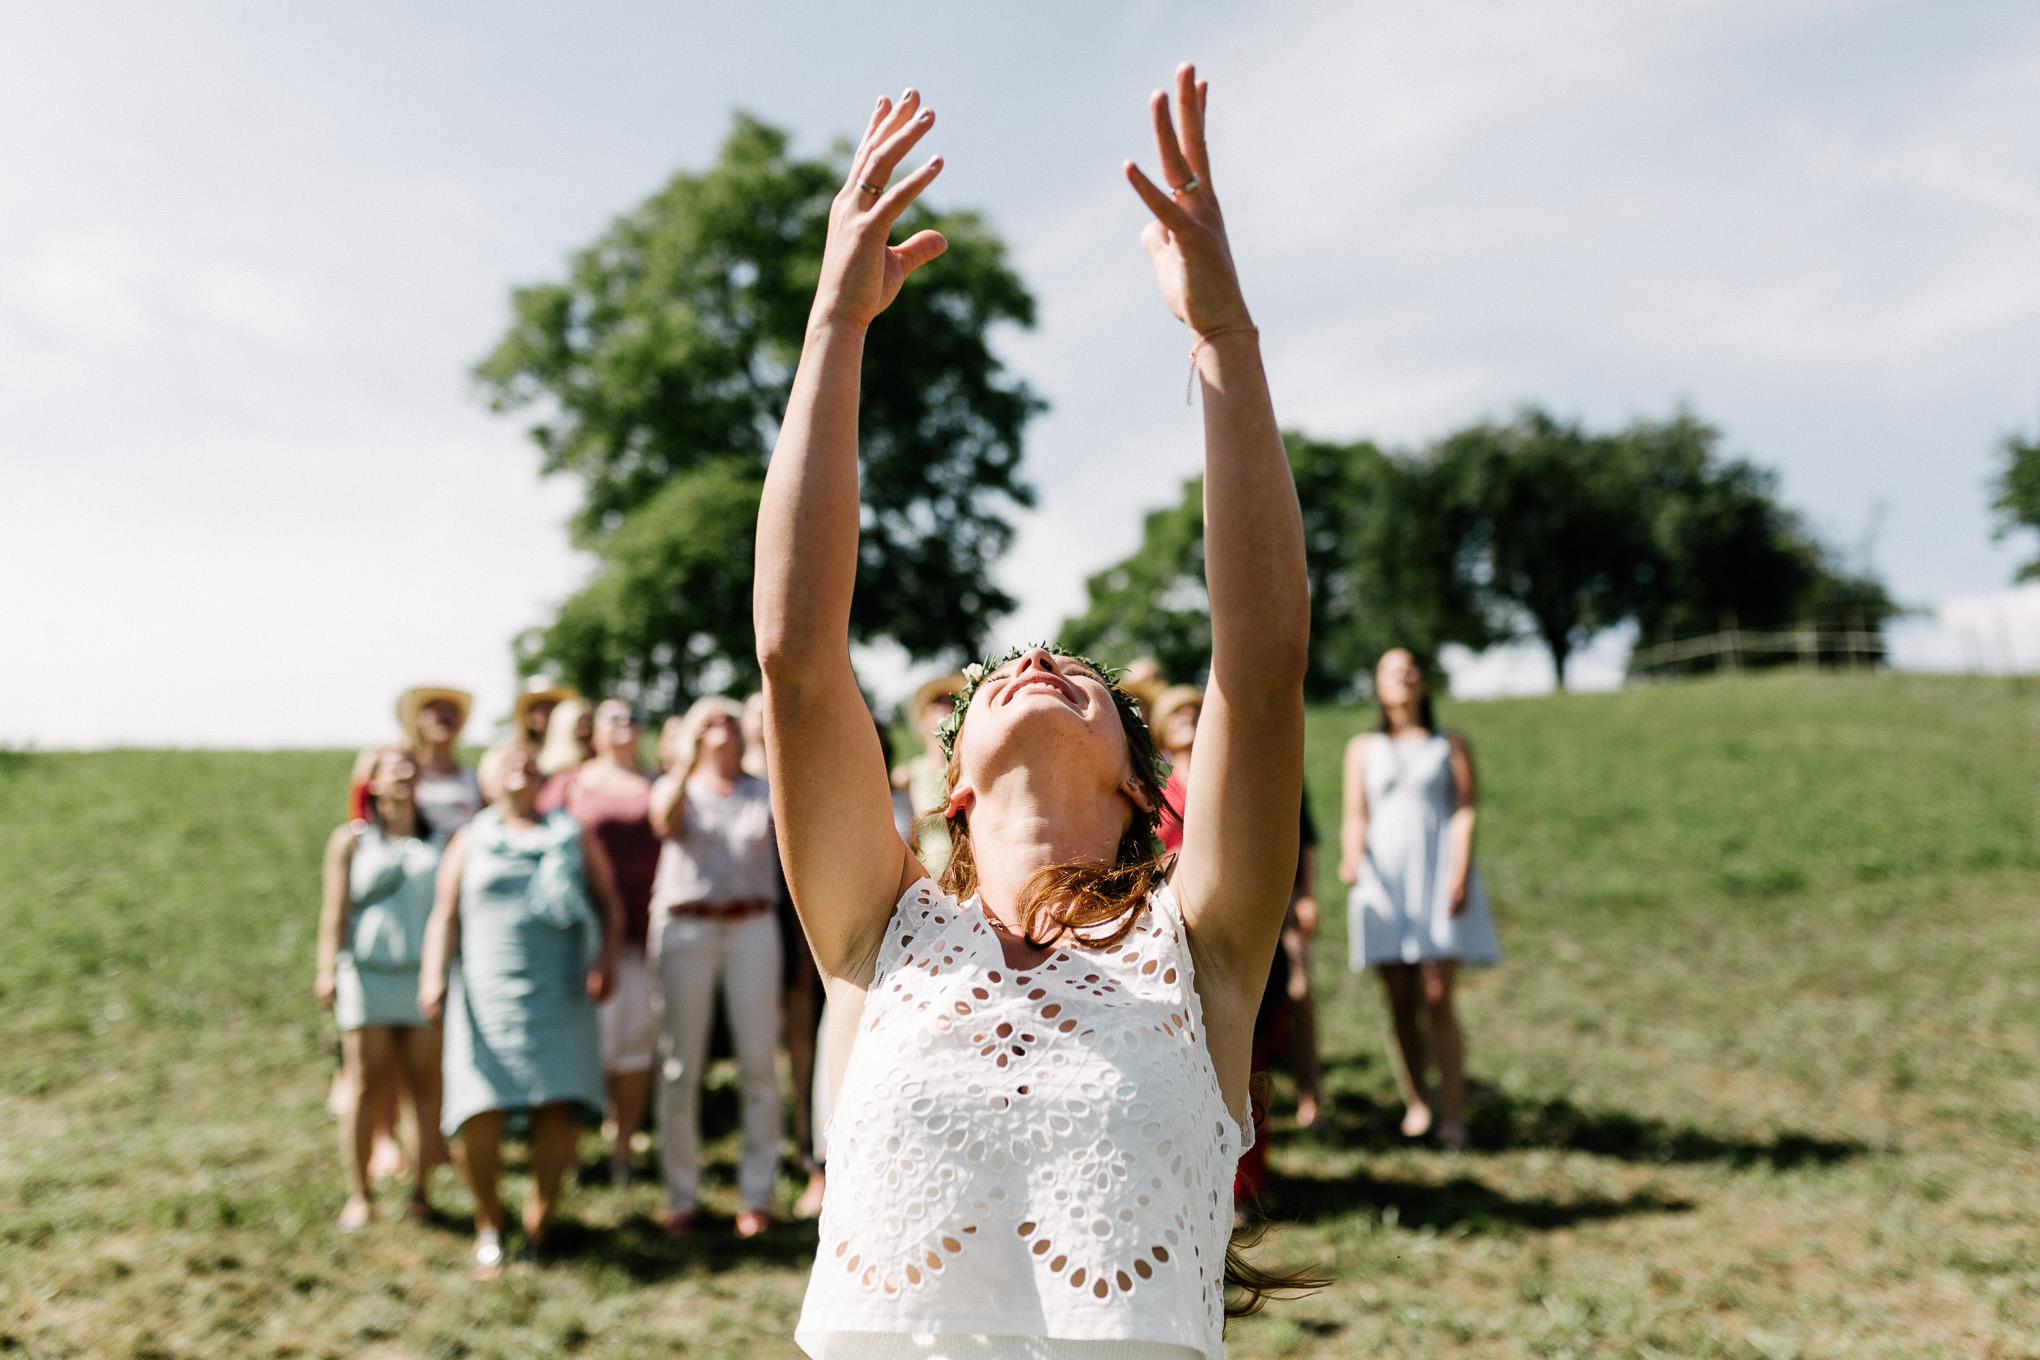 Boho-Scheune-Bauern-Hochzeit-Lörrach-Rheinfelden-Pia-Anna-Christian-Photography-NC-45.jpg